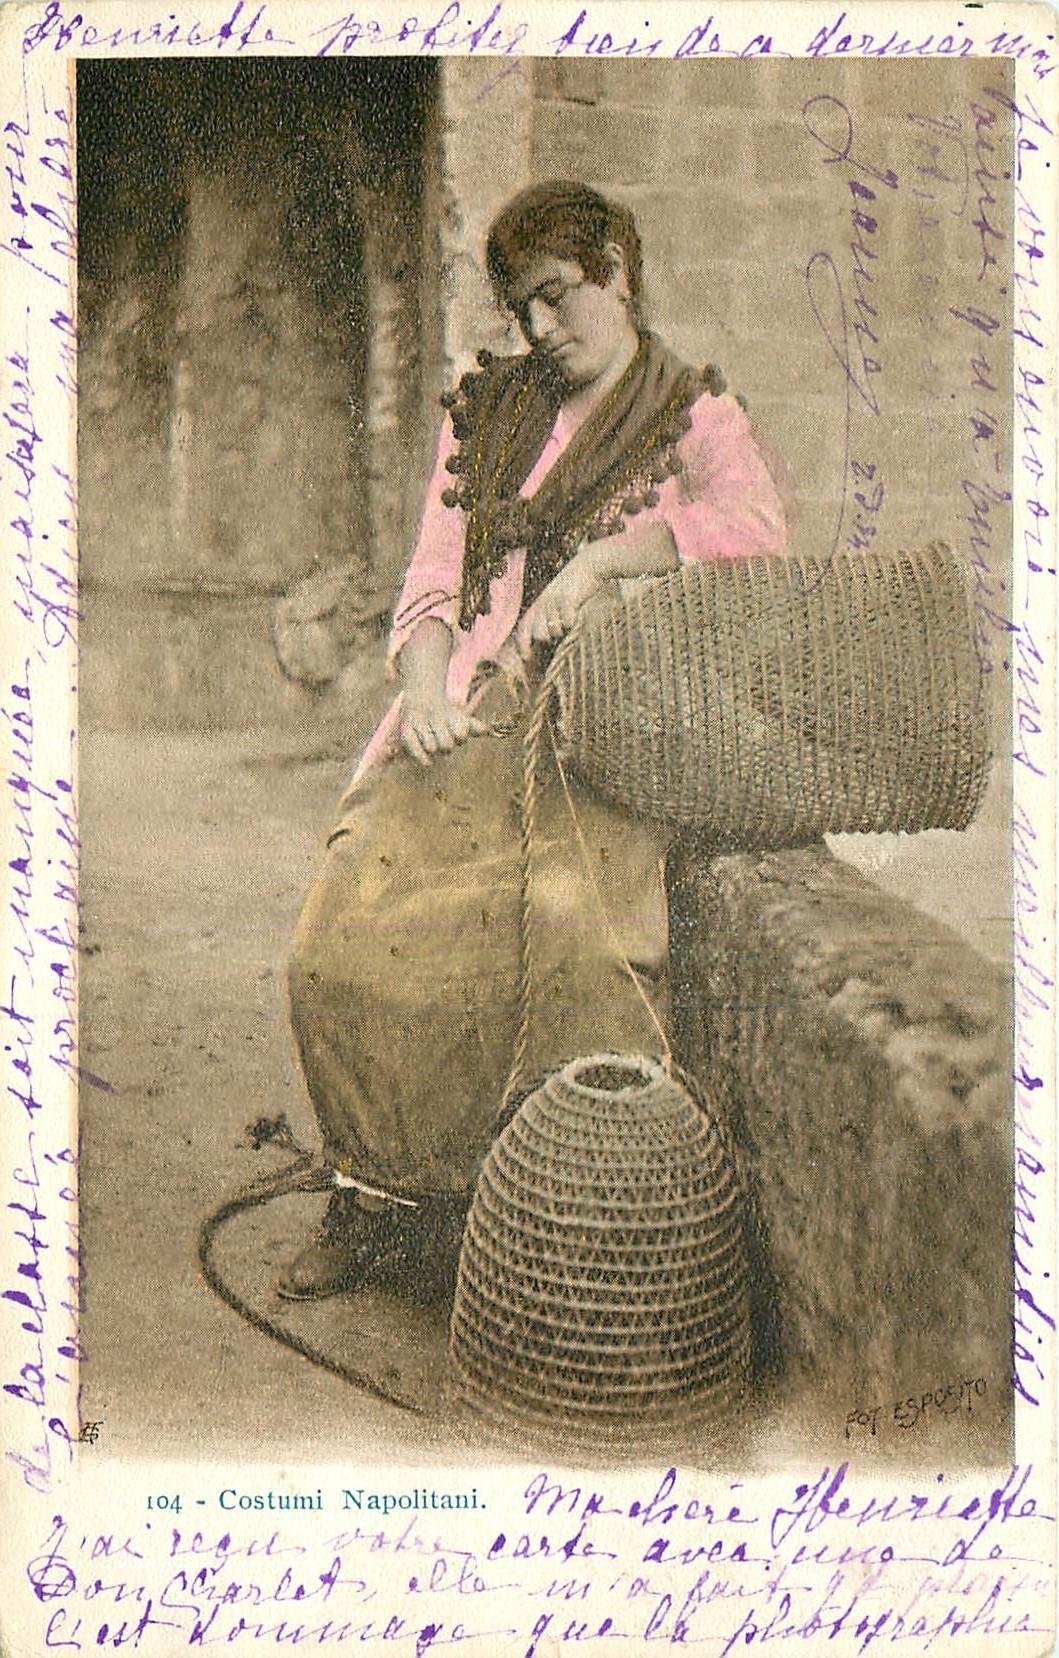 WW NAPOLI. Pêcheuse de Homards en Costumi Napolitani en Italie 1902